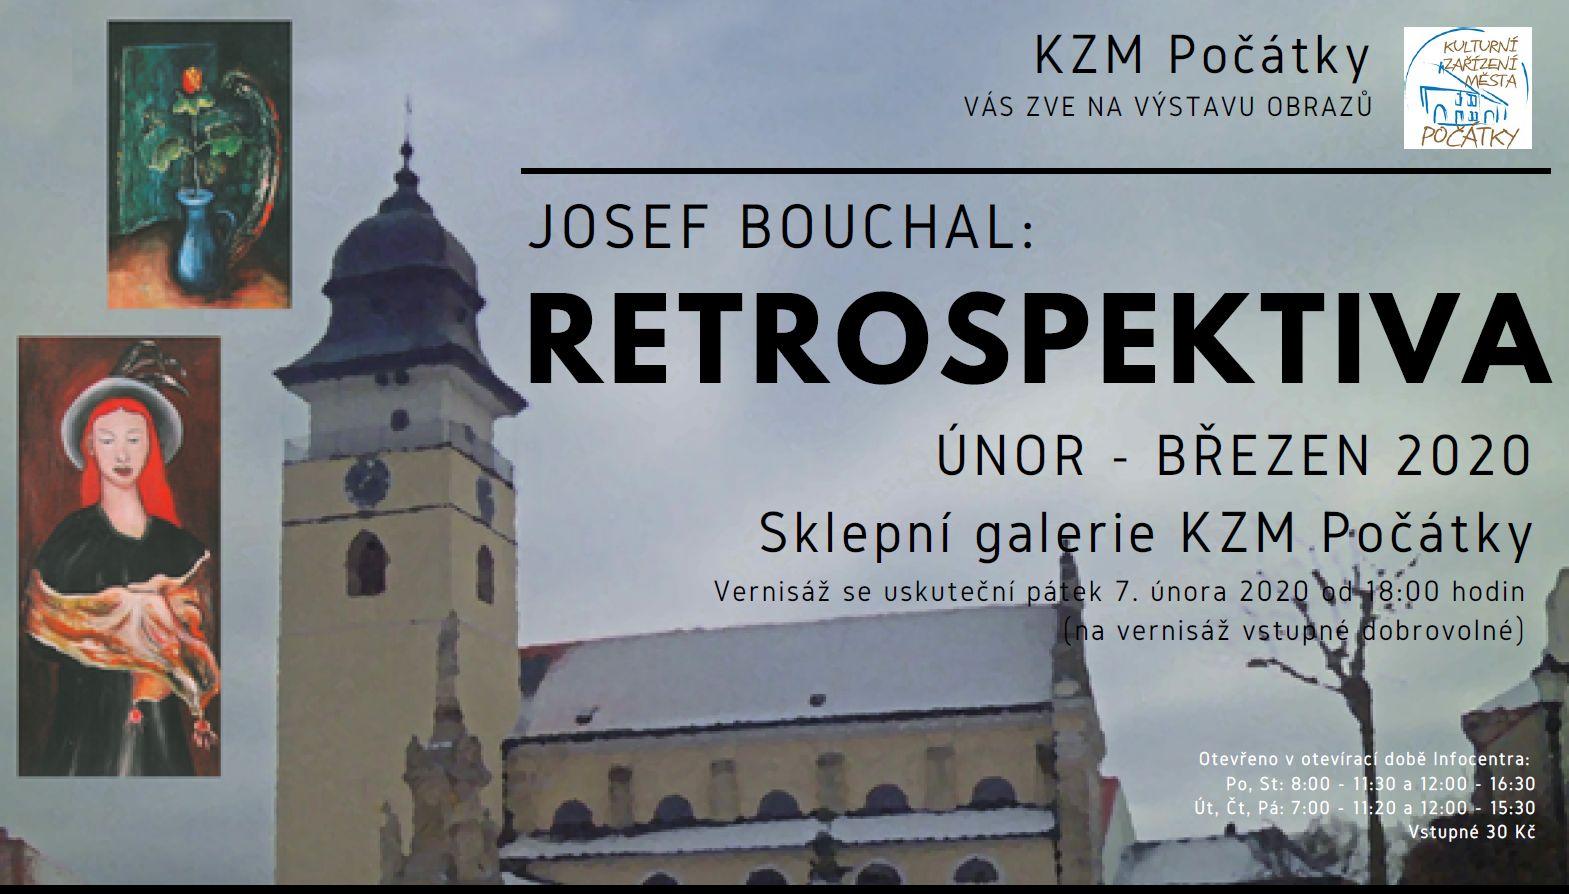 Josef Bouchal: RETROSPEKTIVA